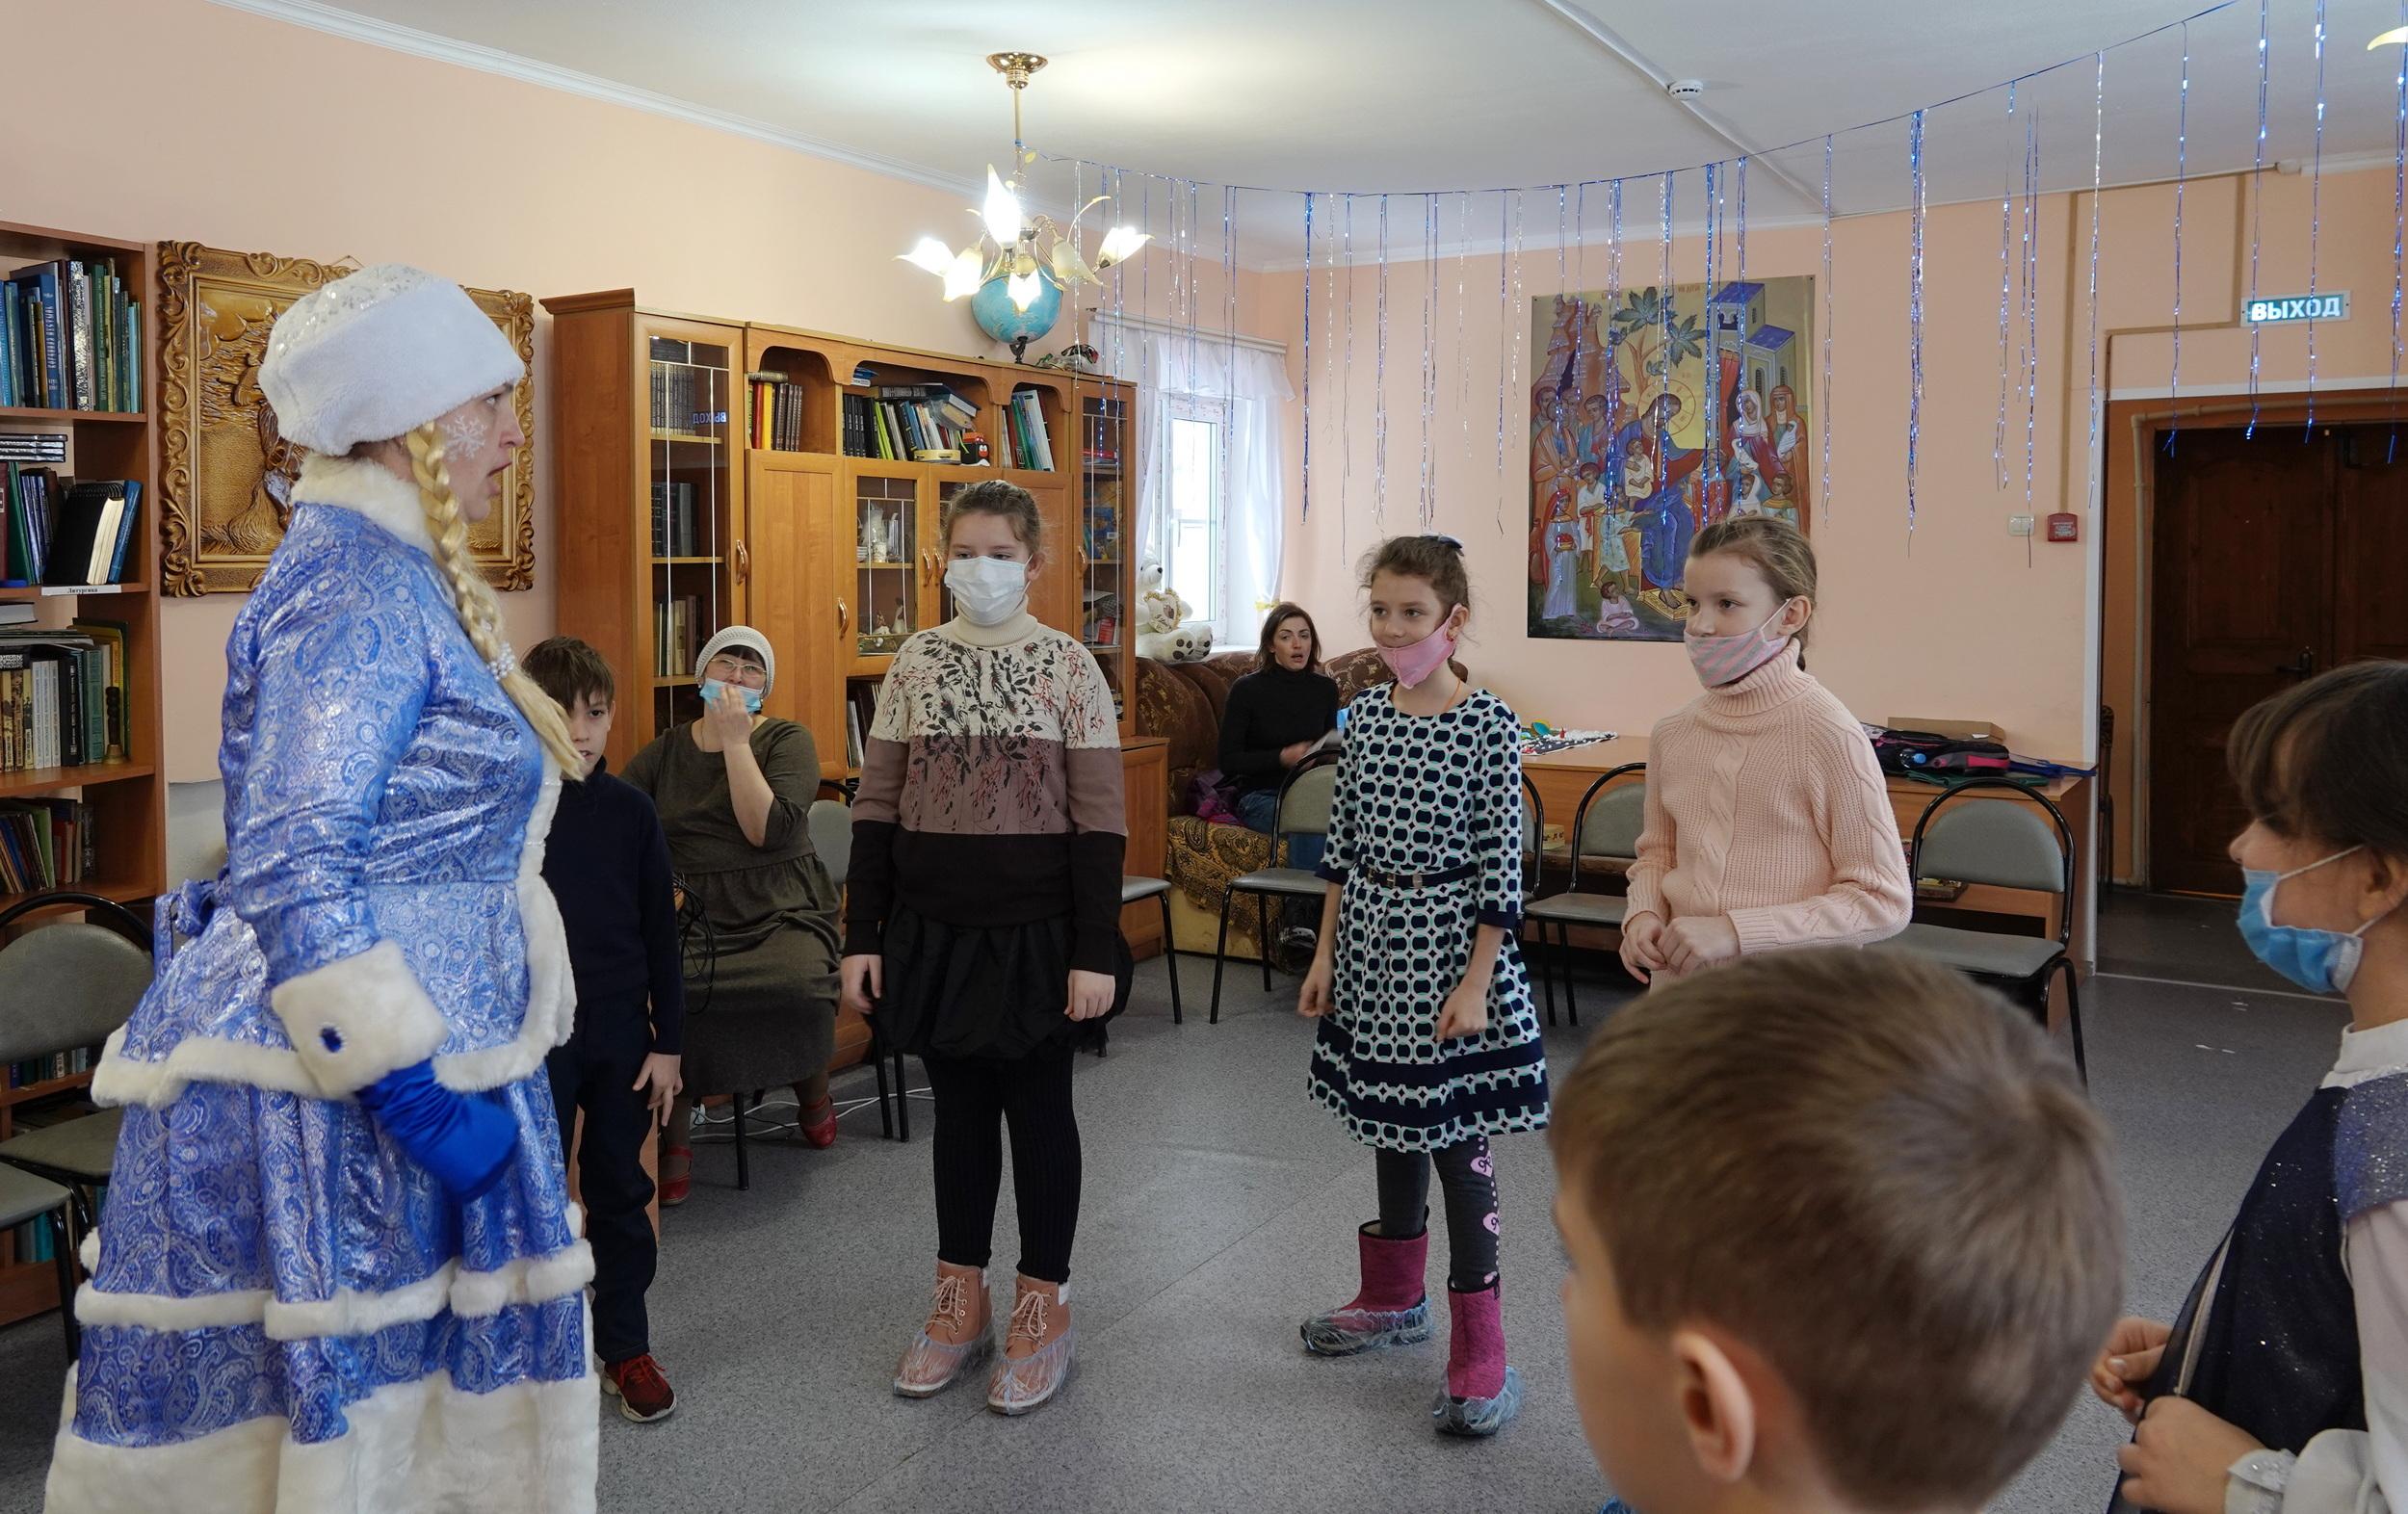 http://monuspen.ru/photoreports/c79af77f811e227264239bc8cfb51fbl.JPG